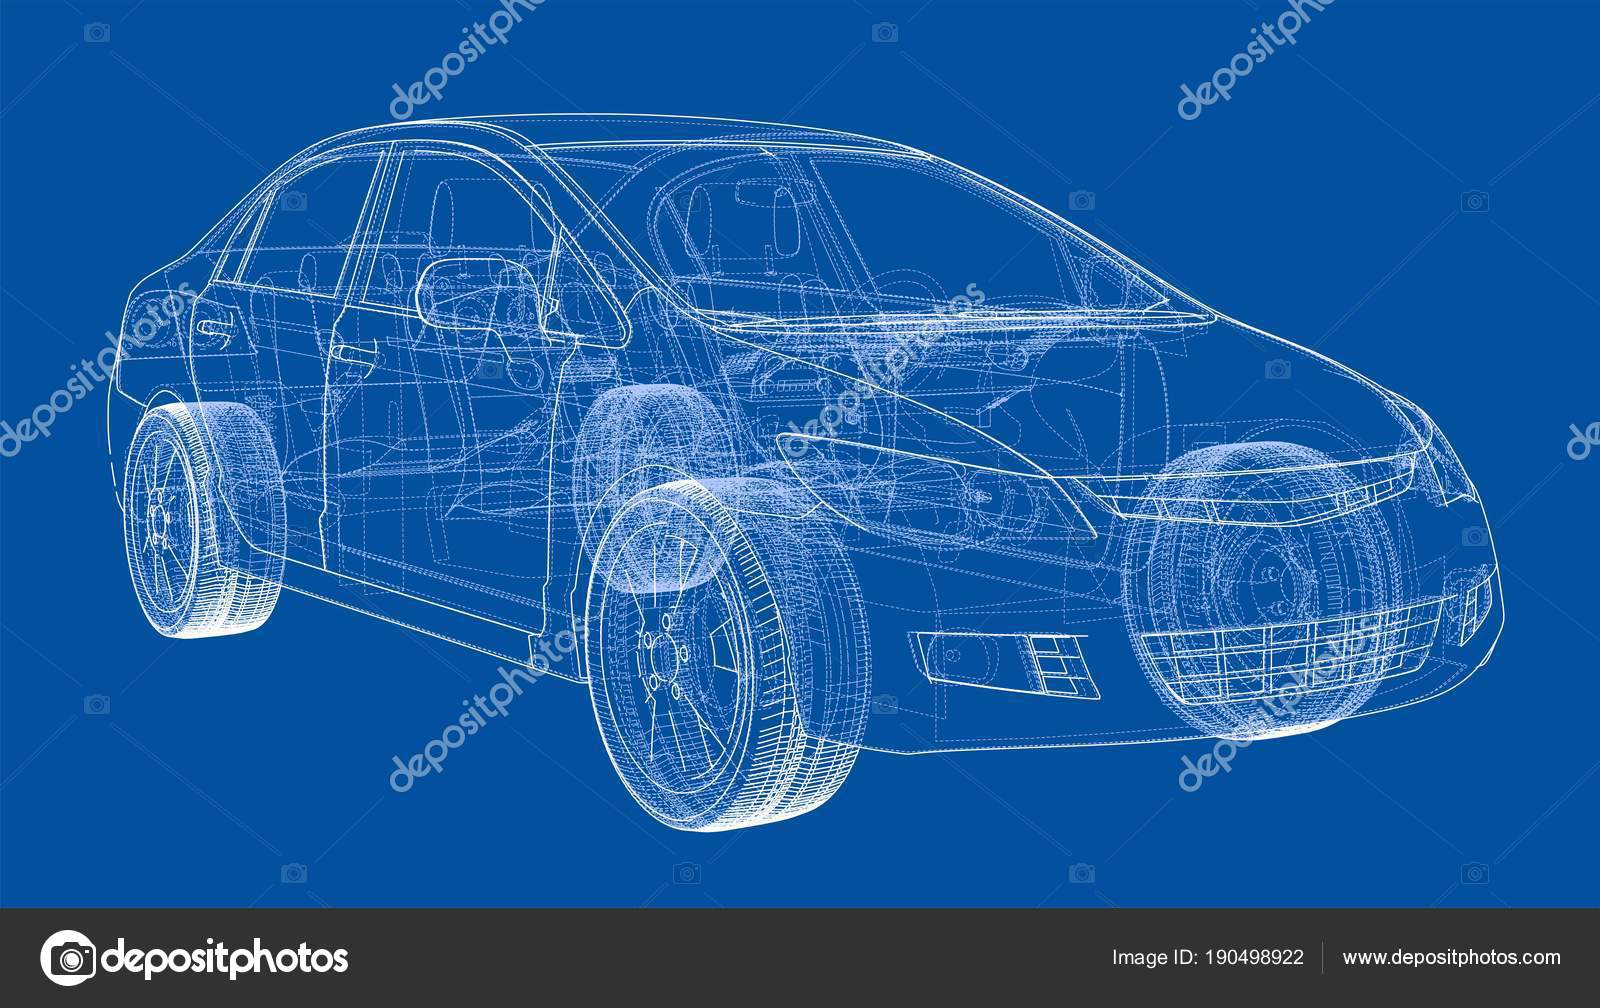 Concept car blueprint stock photo cherezoff 190498922 concept car blueprint stock photo malvernweather Images